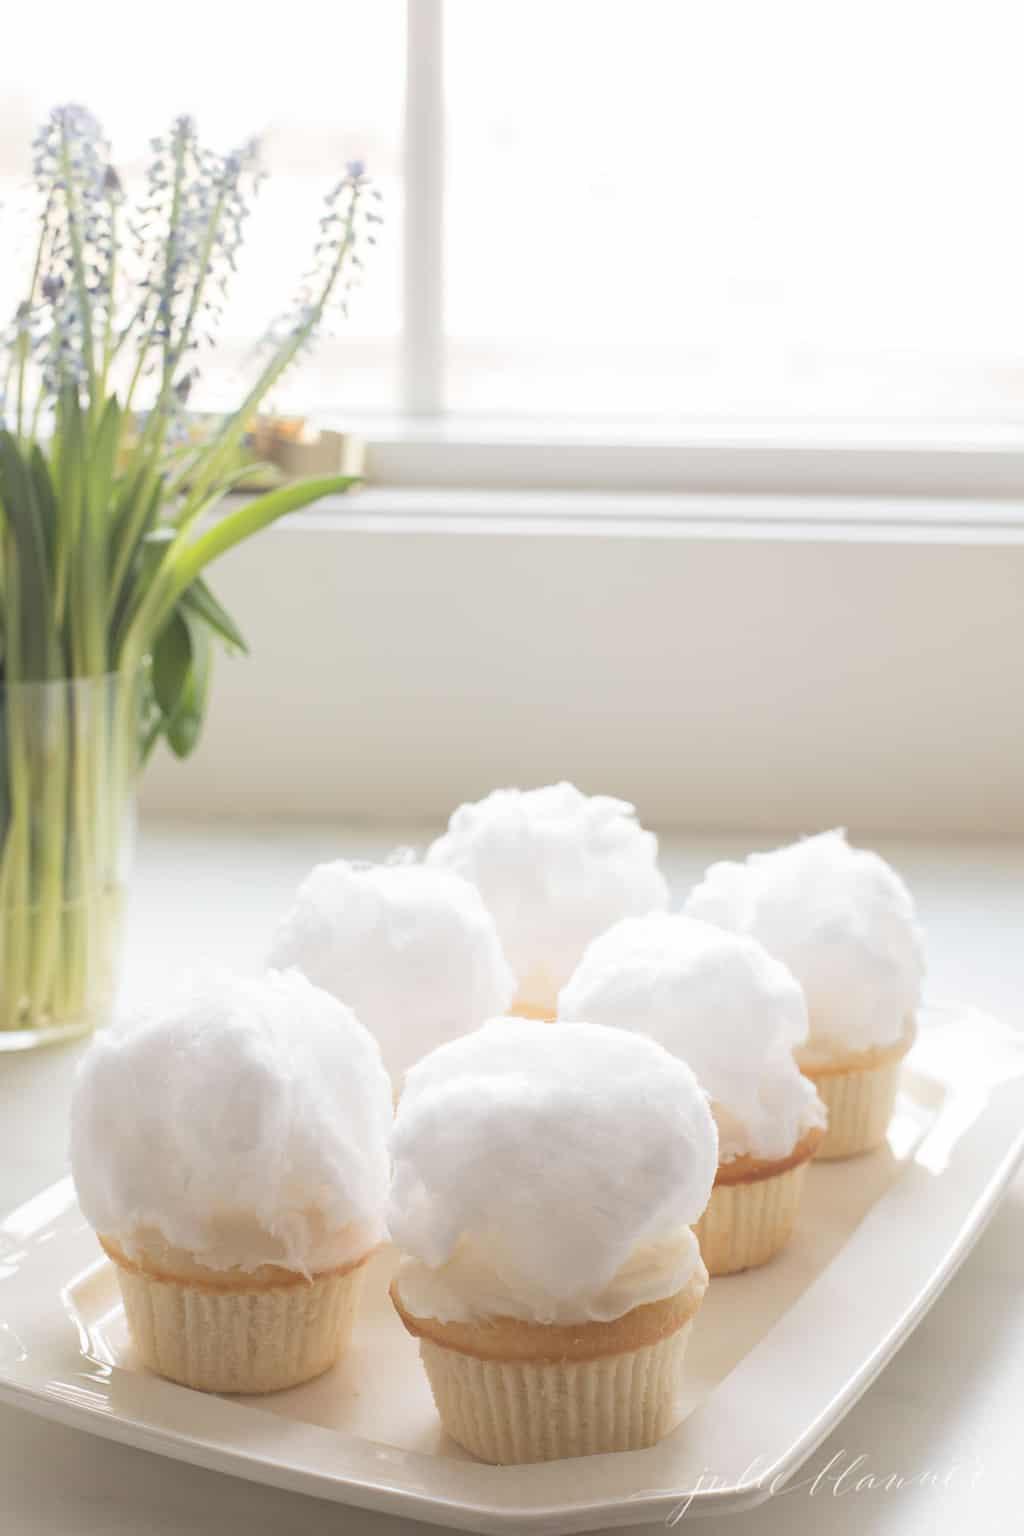 bunny-tail-cupcake-easter-dessert